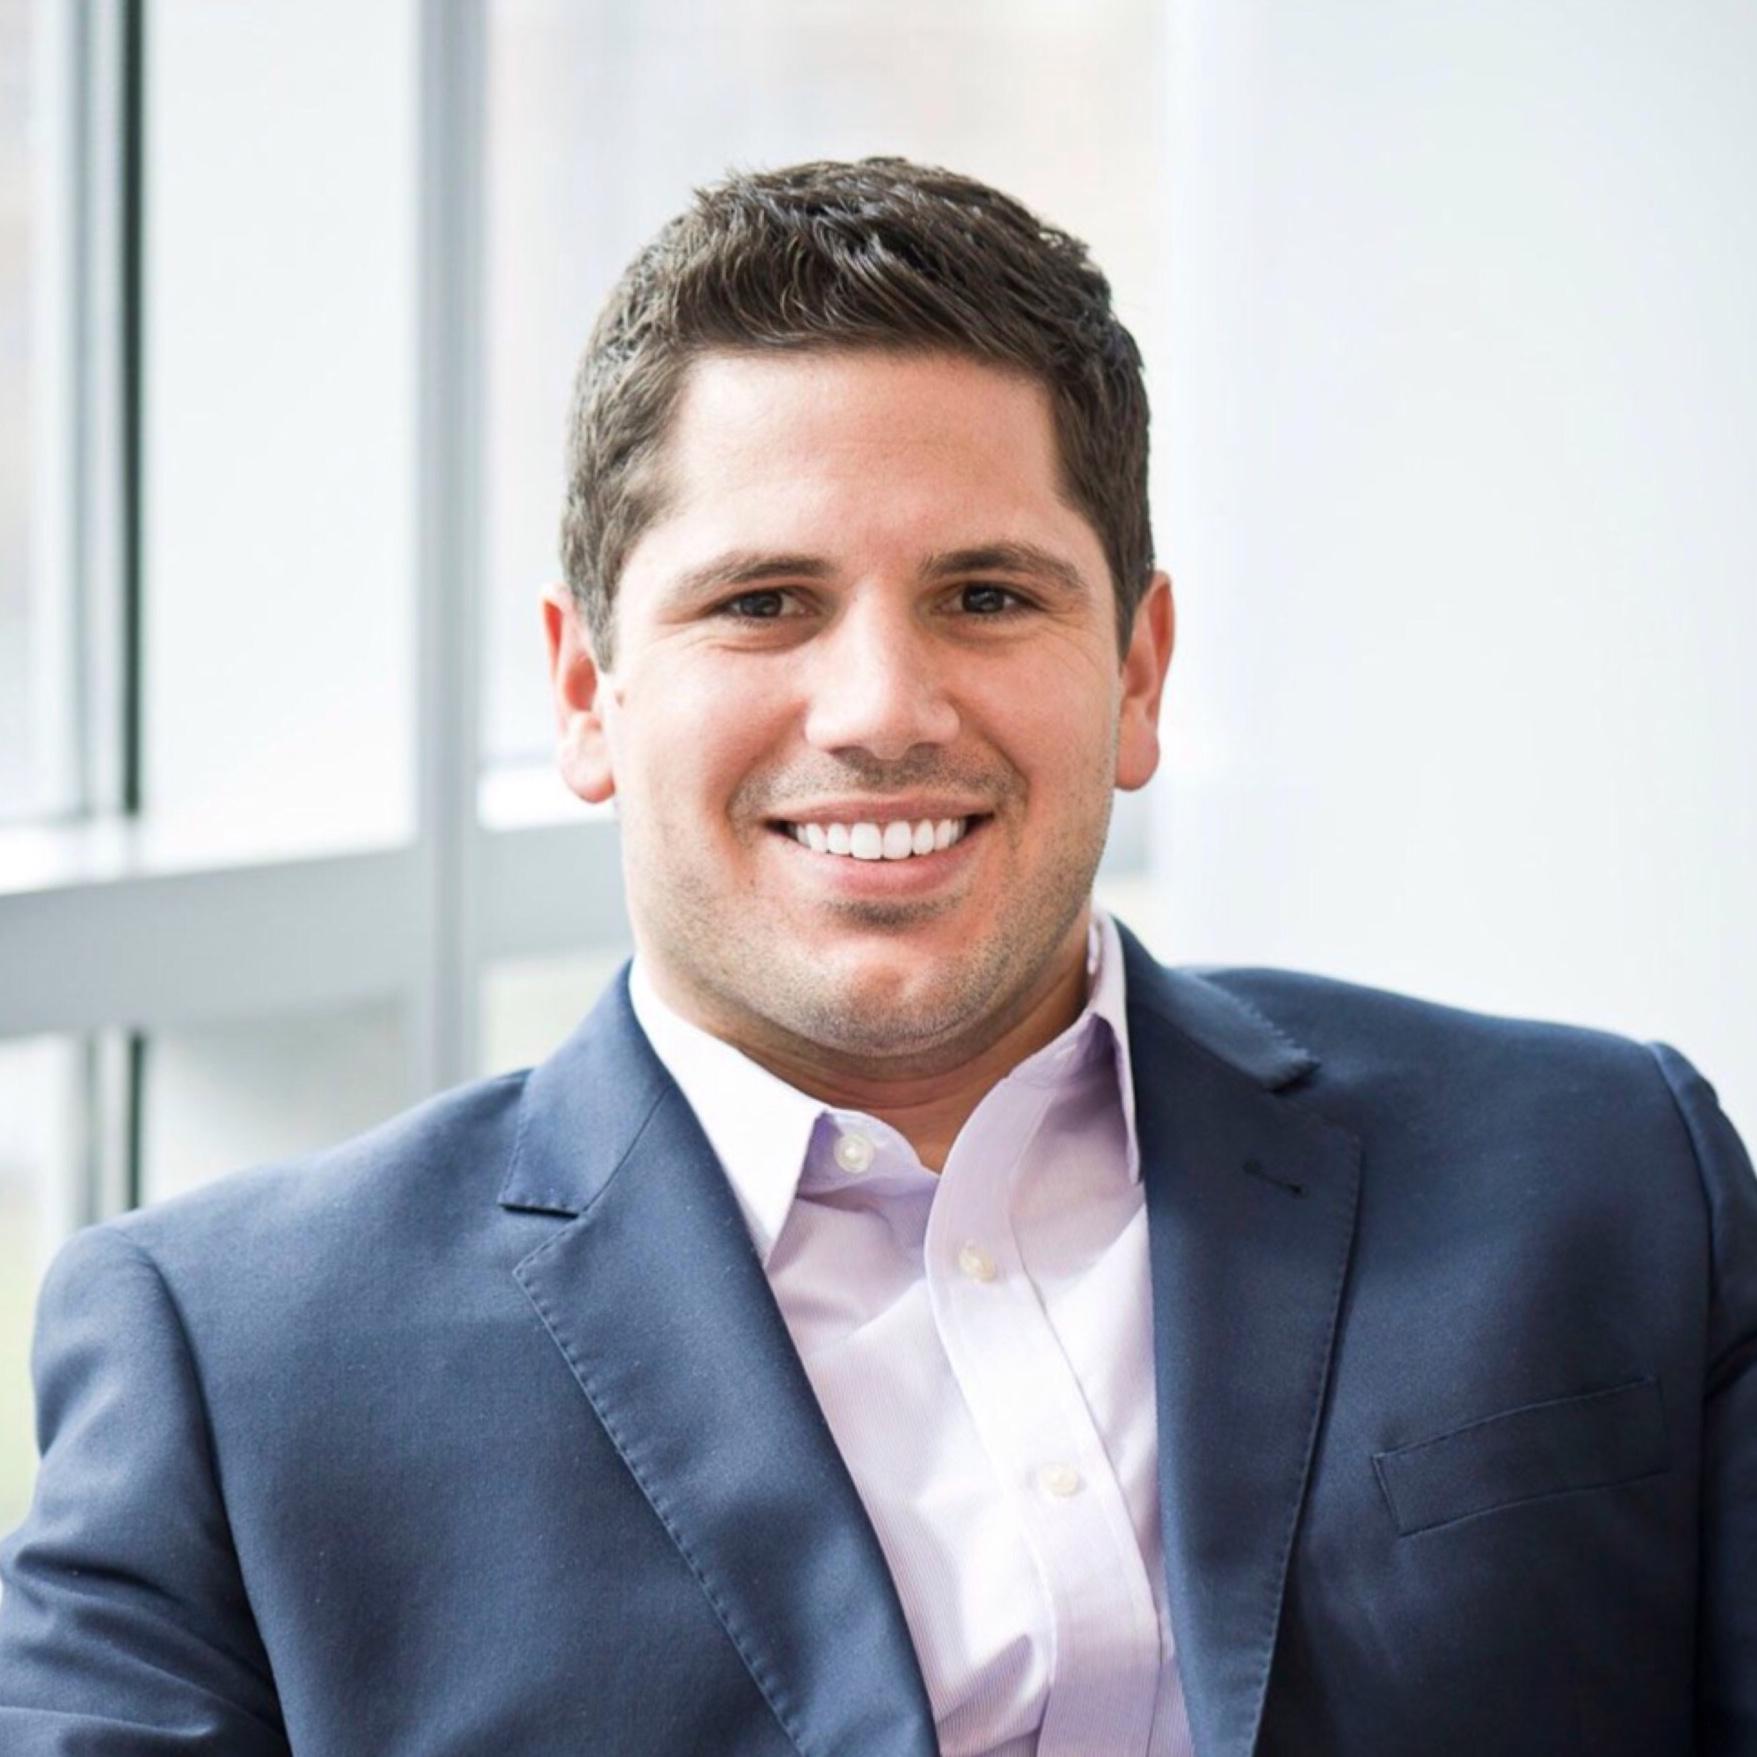 Michael Pistone, Director of Innovation Acceleration at Cincinnati Children's Hospital Medical Center.